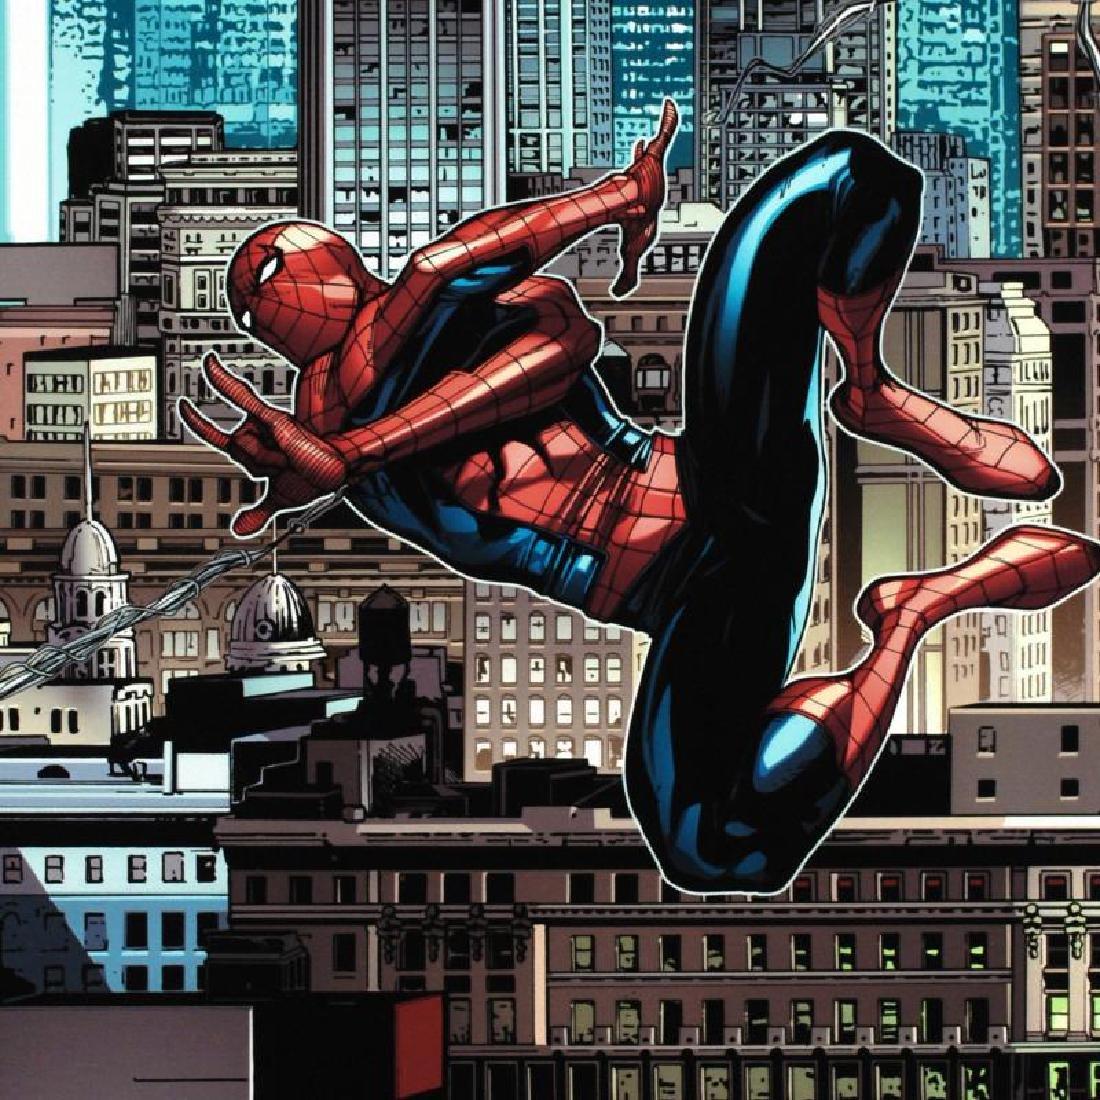 Amazing Spider-Man #666 by Marvel Comics - 2